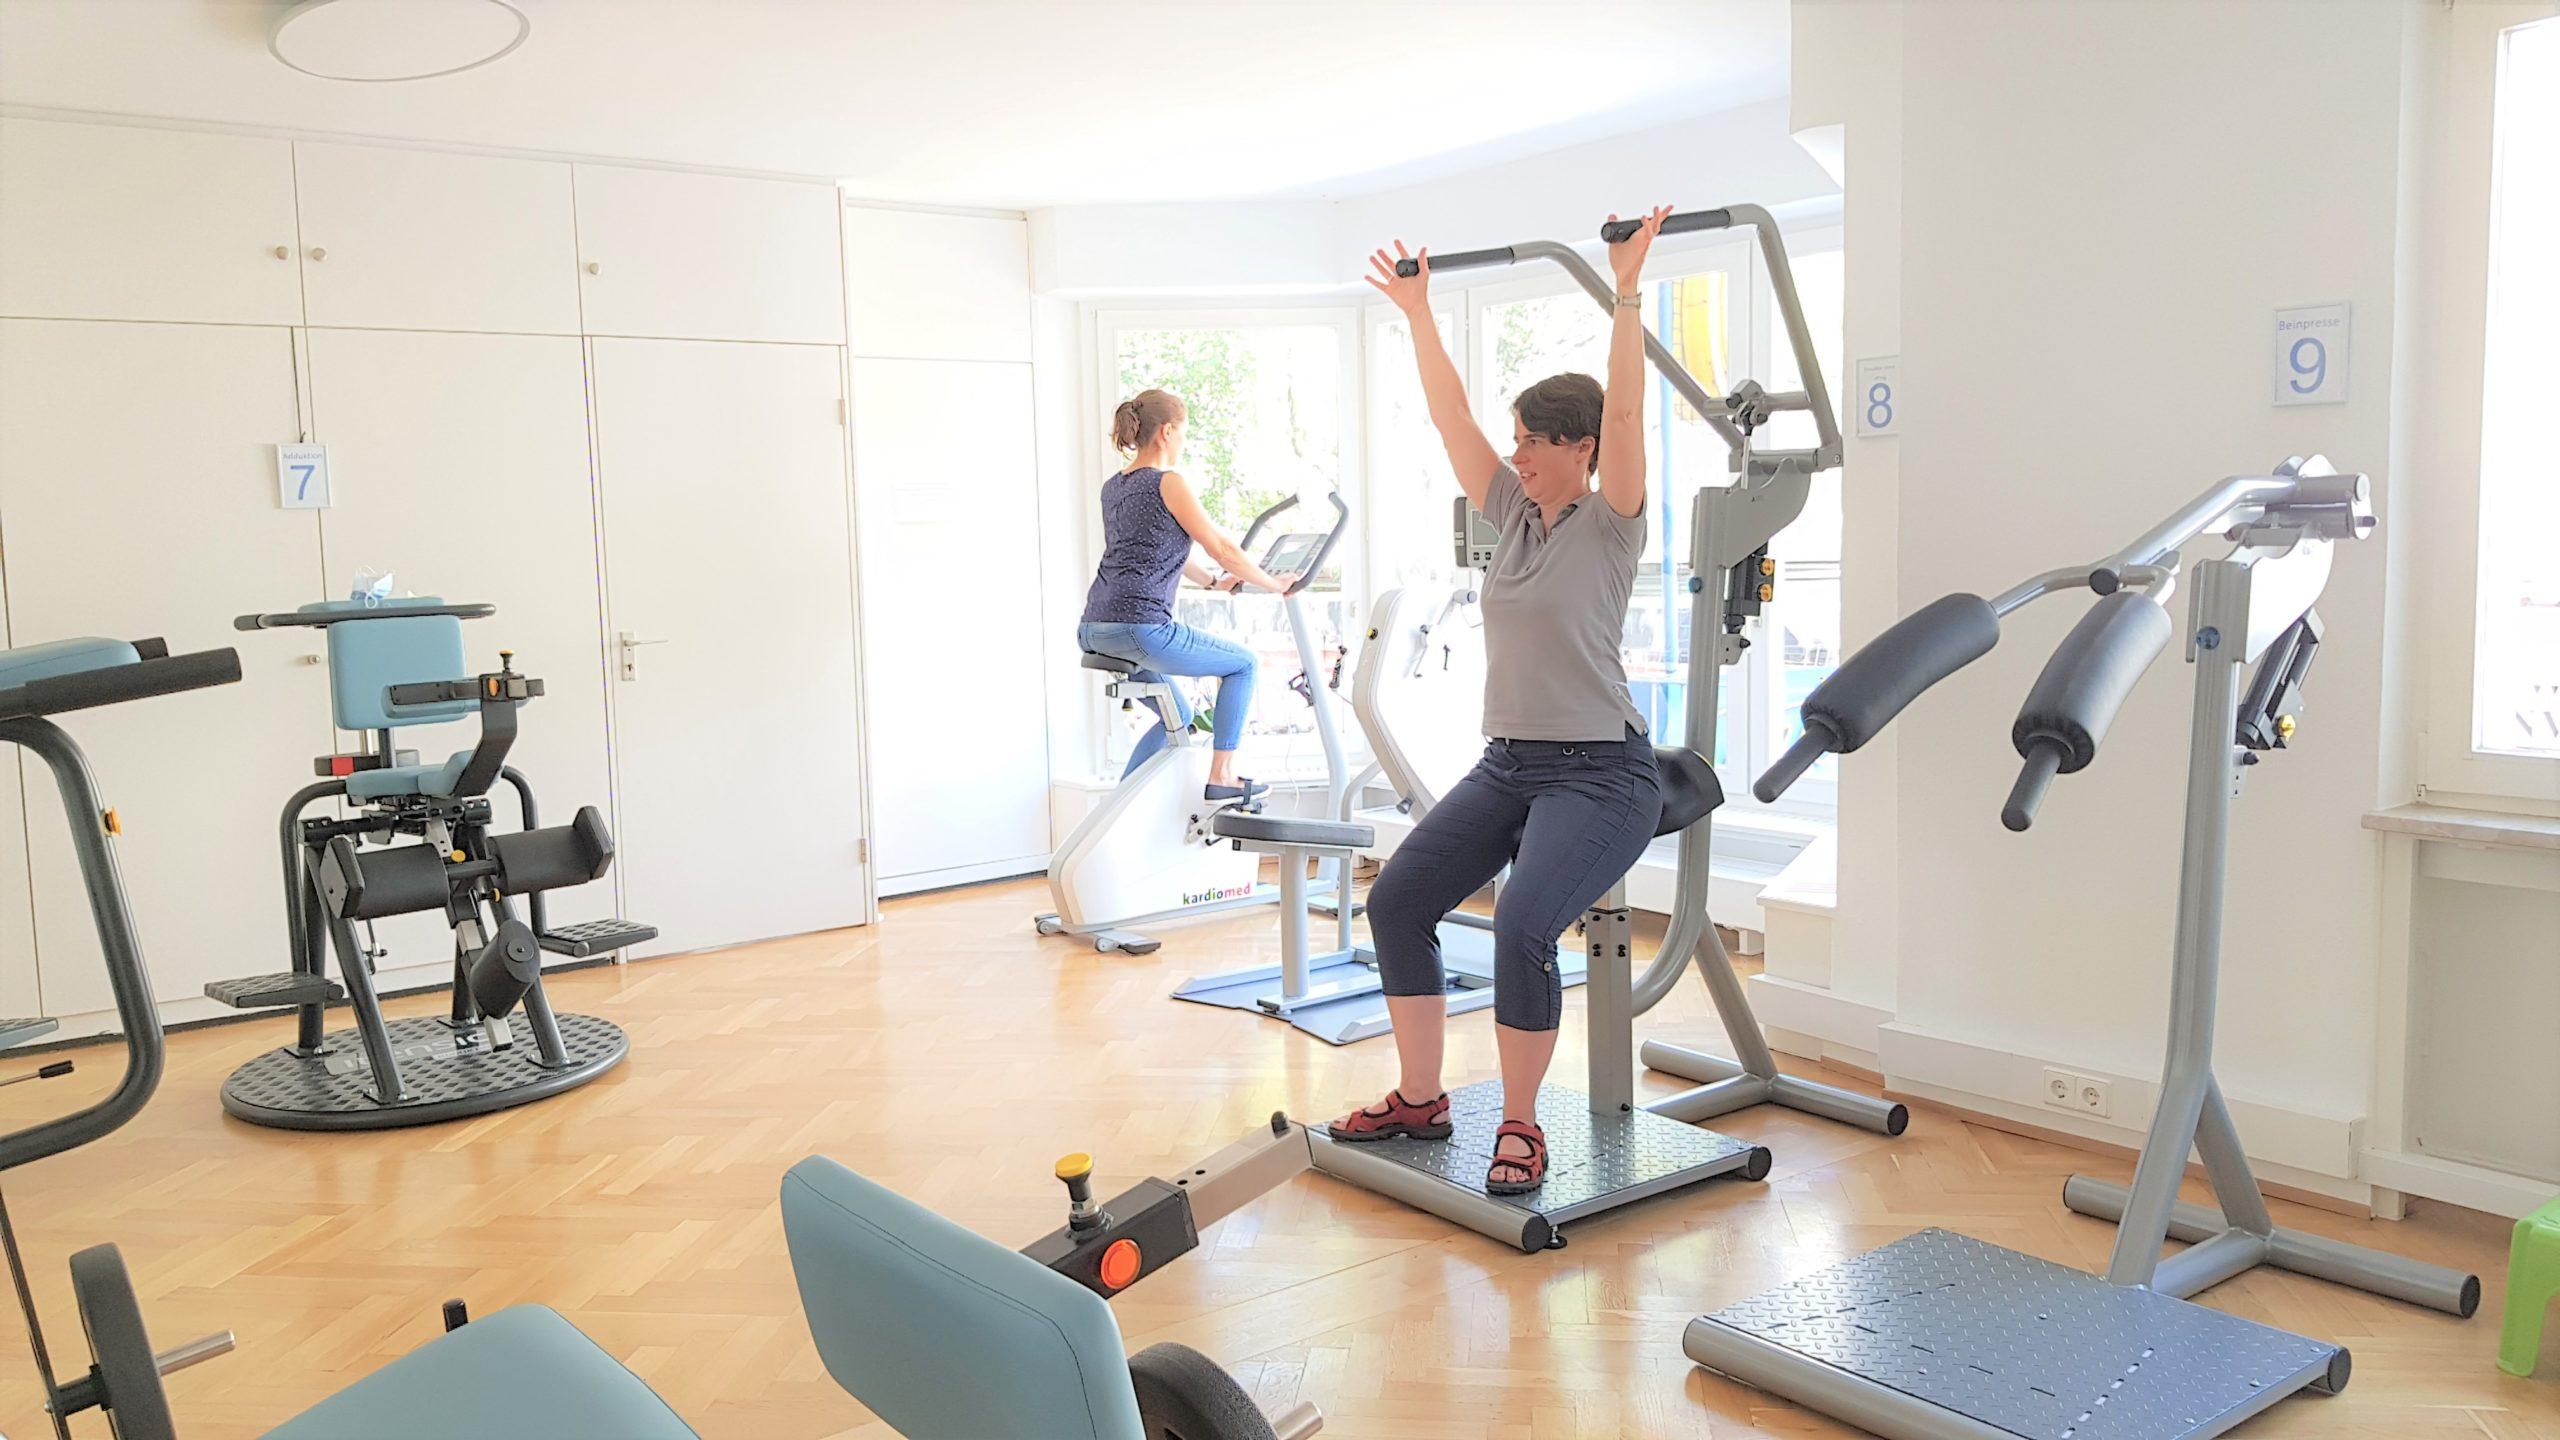 Physio - Point Kehl - Krankengymnastik, Massage, Manuelle